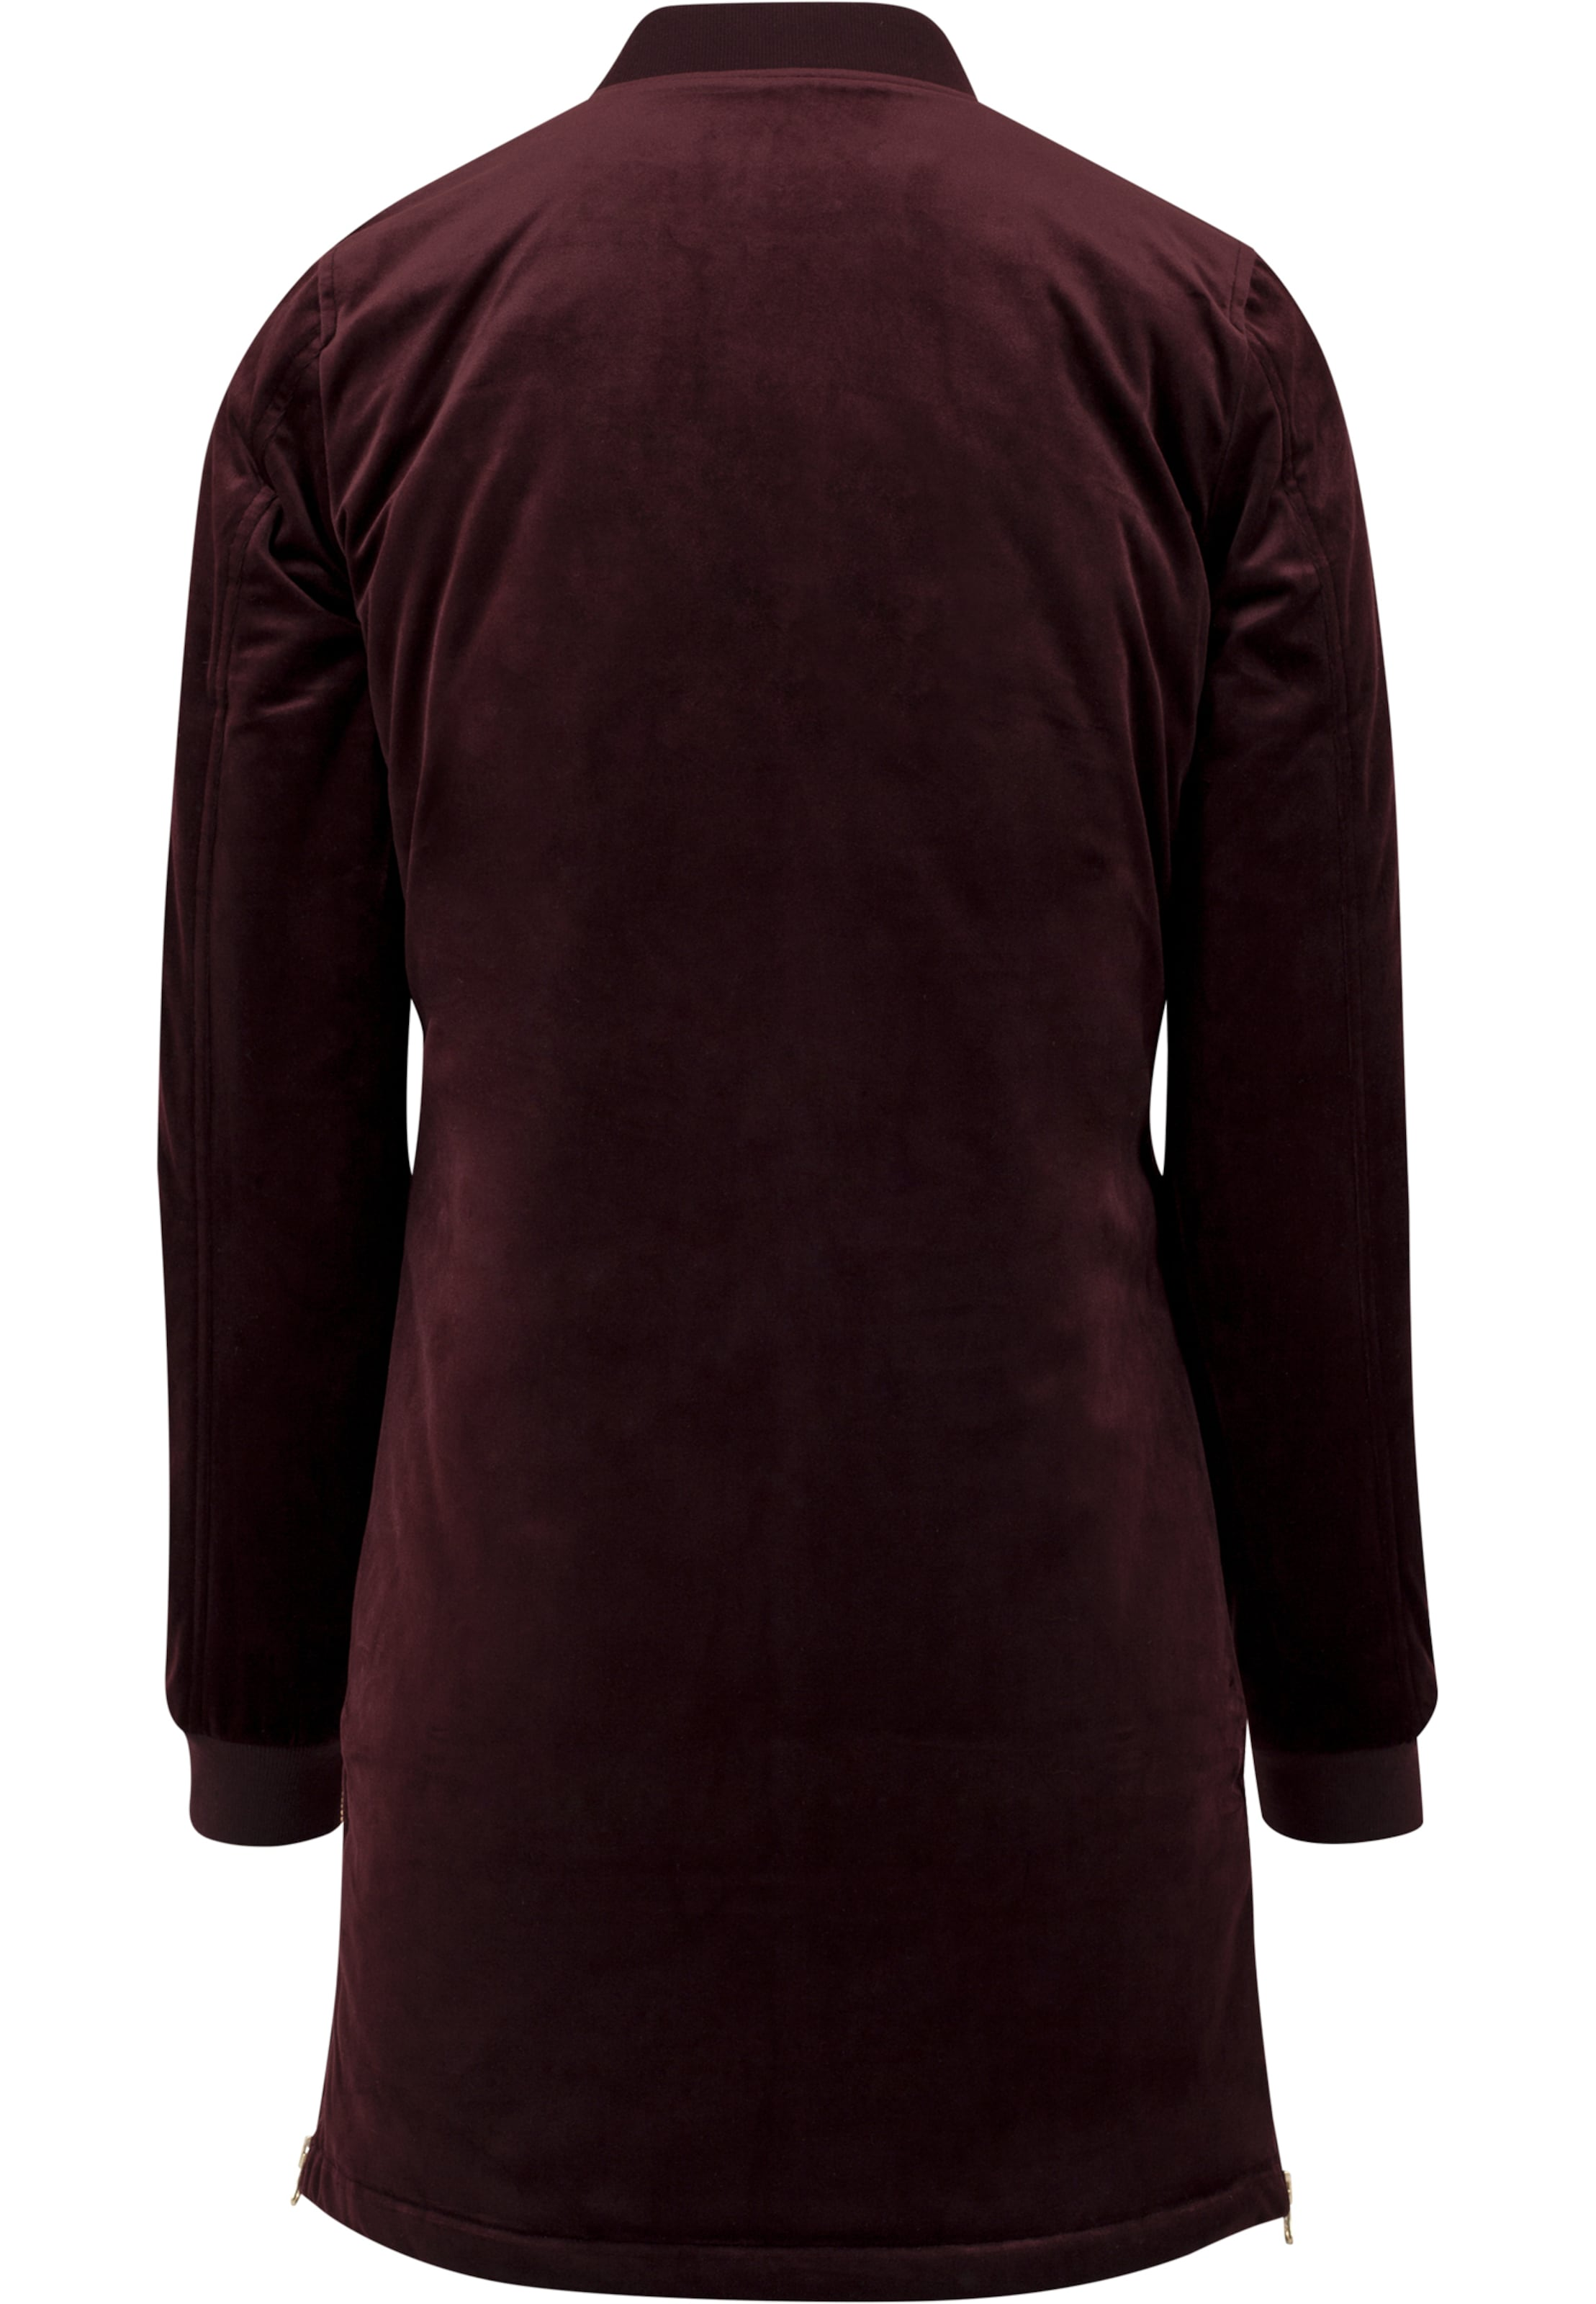 Jacket Jacket Urban In Burgunder Urban Classics Classics srxBQdtCho